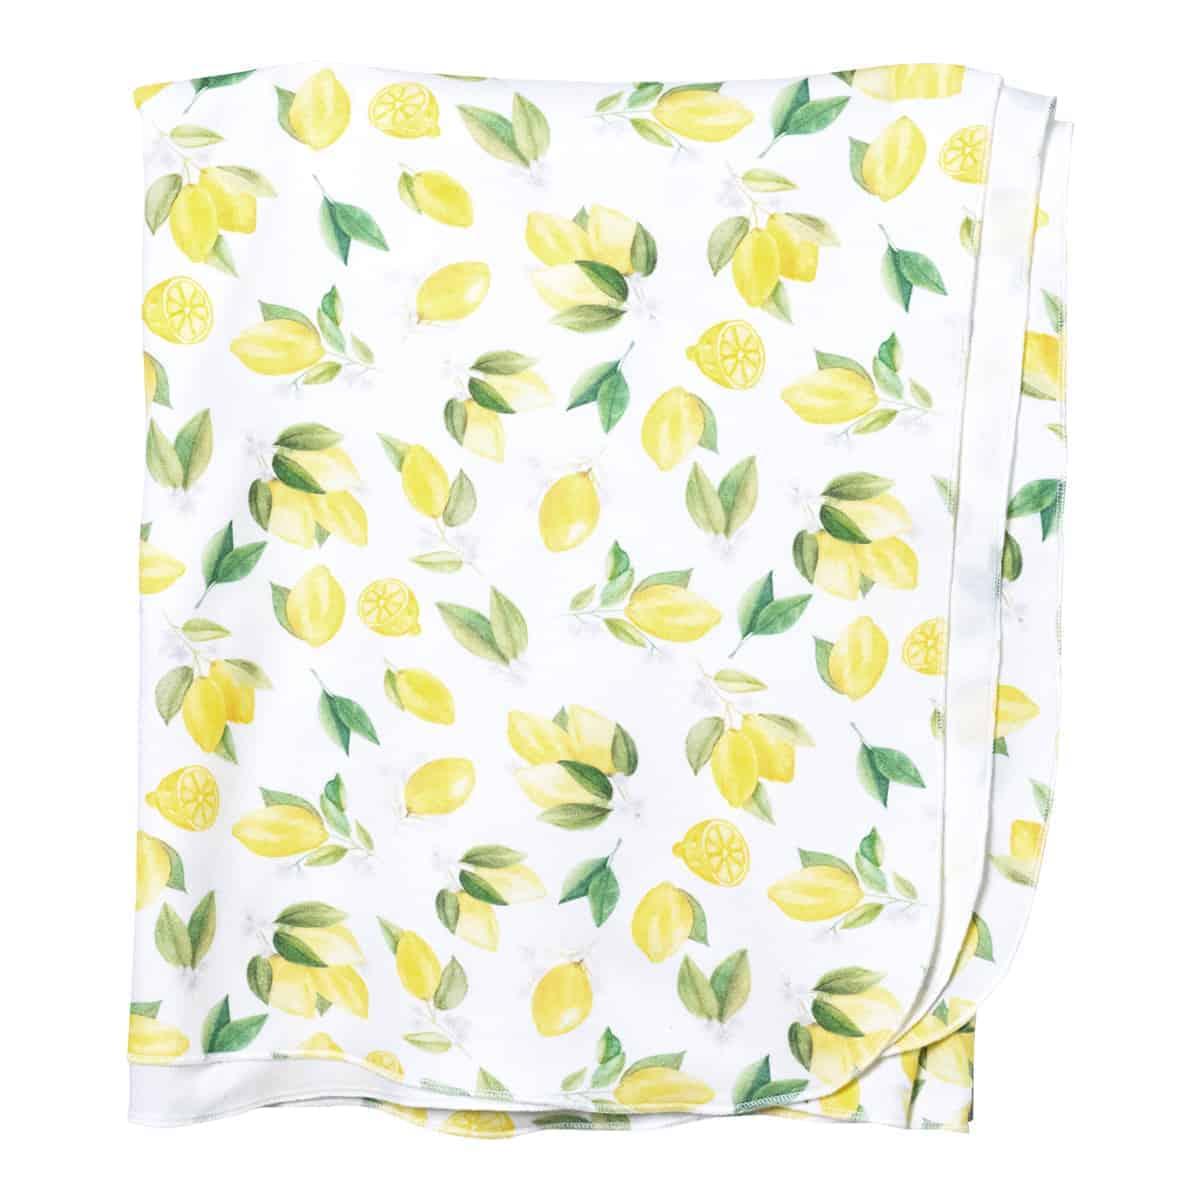 Stroller-n-Swaddle blanket in Lemon